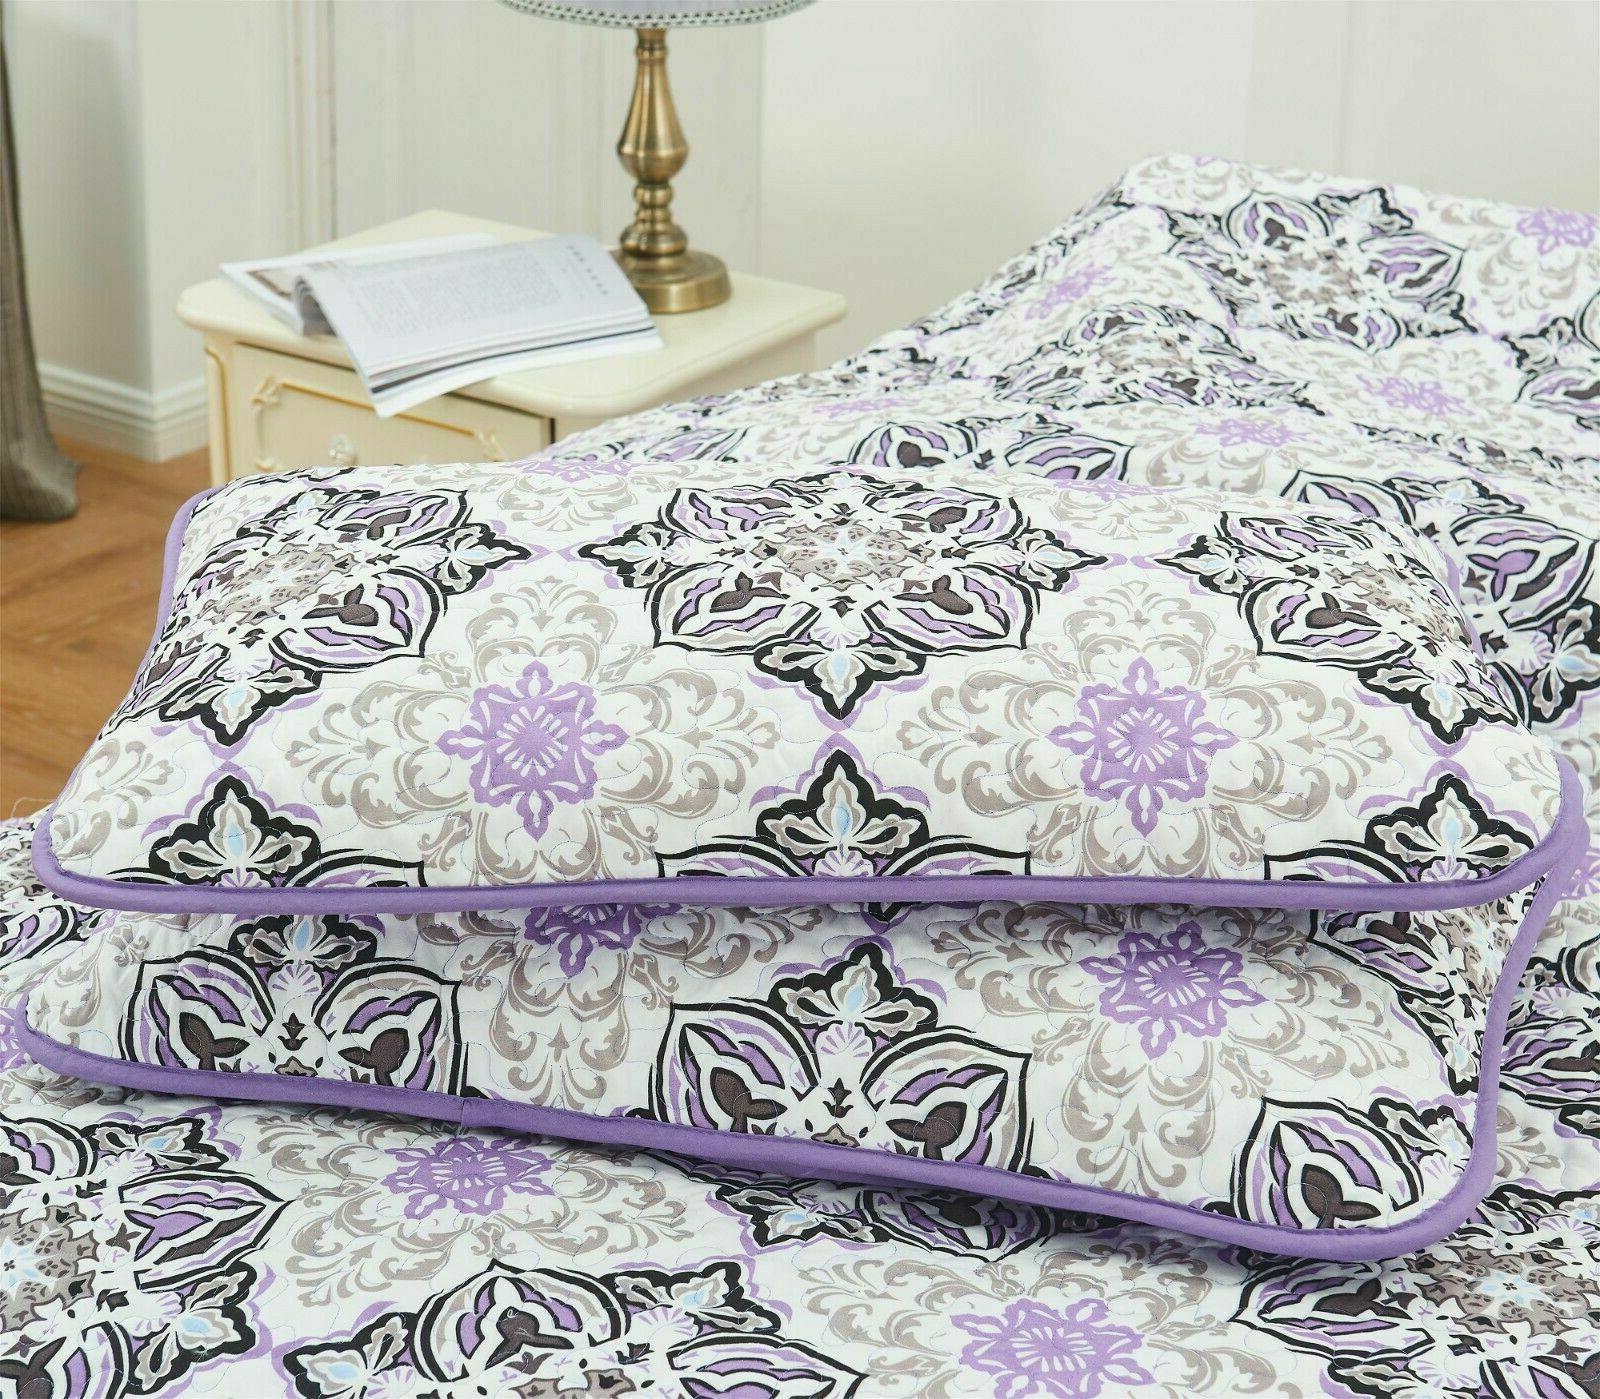 Queen Quilt Bedding Set Printed Quilt King Quilt Bedding Set